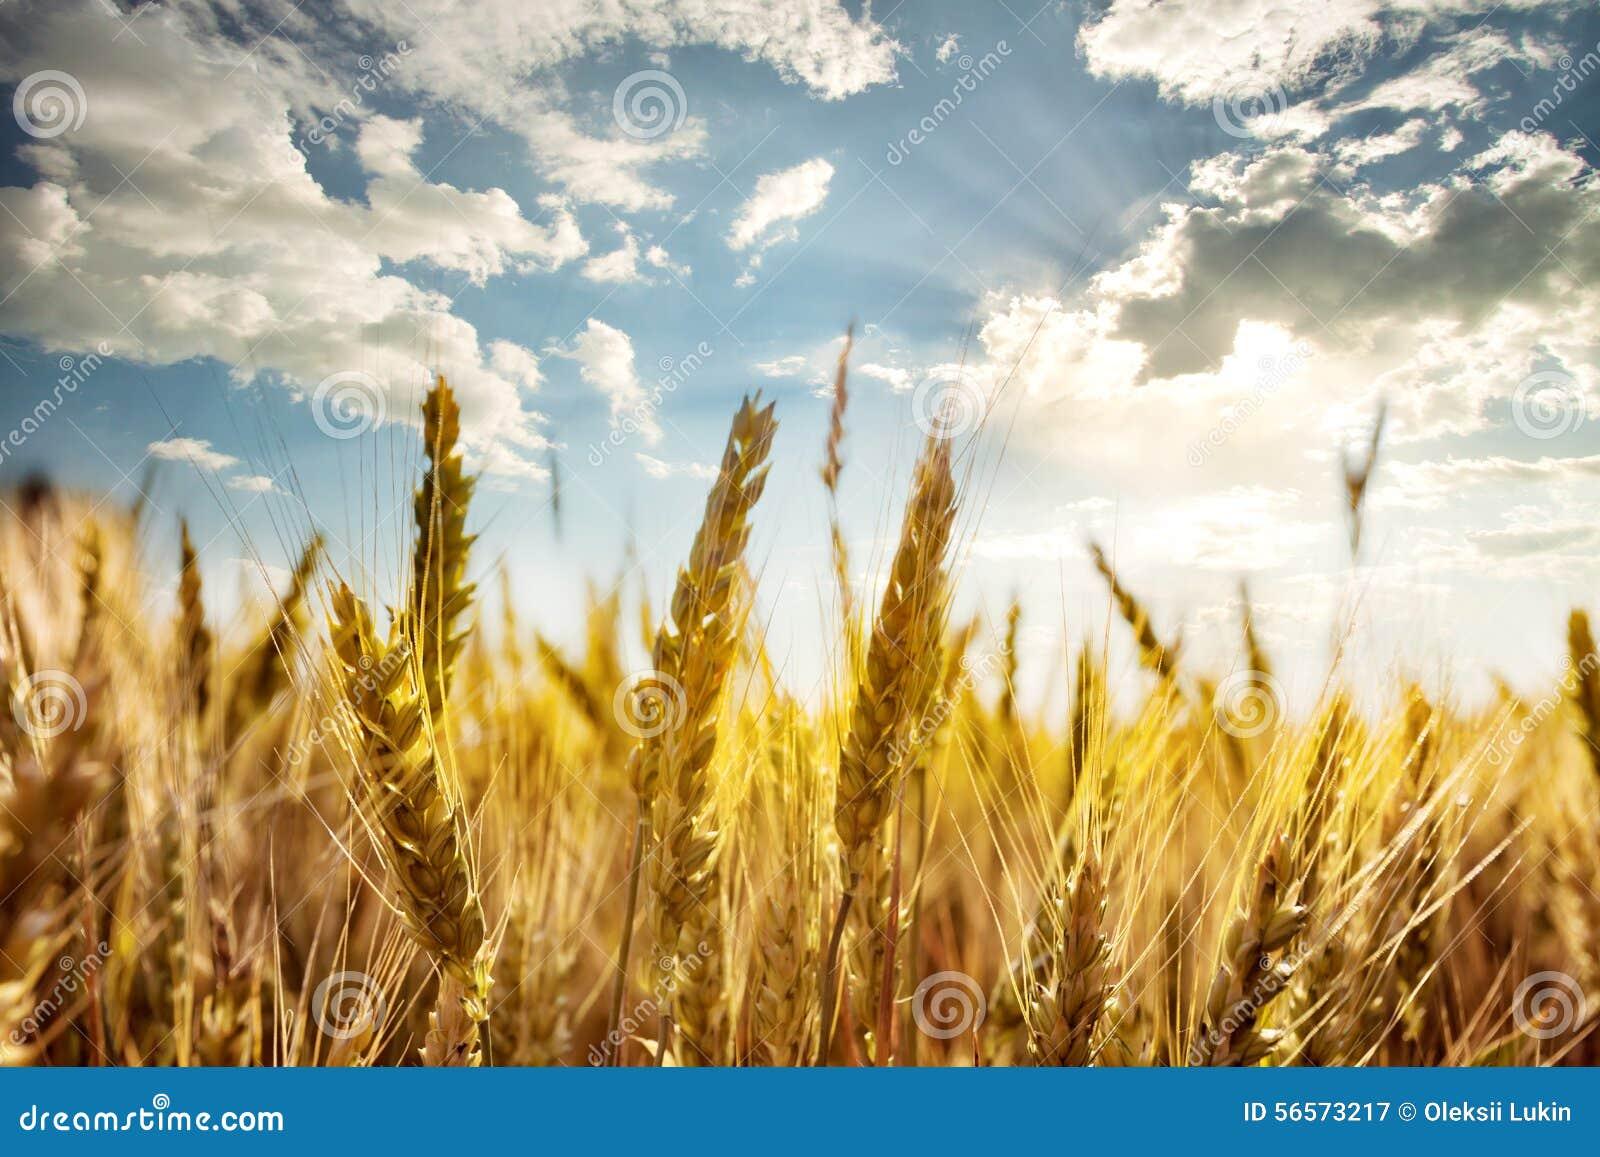 Download Ώριμα αυτιά του σίτου κάτω από το μπλε ουρανό Στοκ Εικόνα - εικόνα από τρόφιμα, φως: 56573217